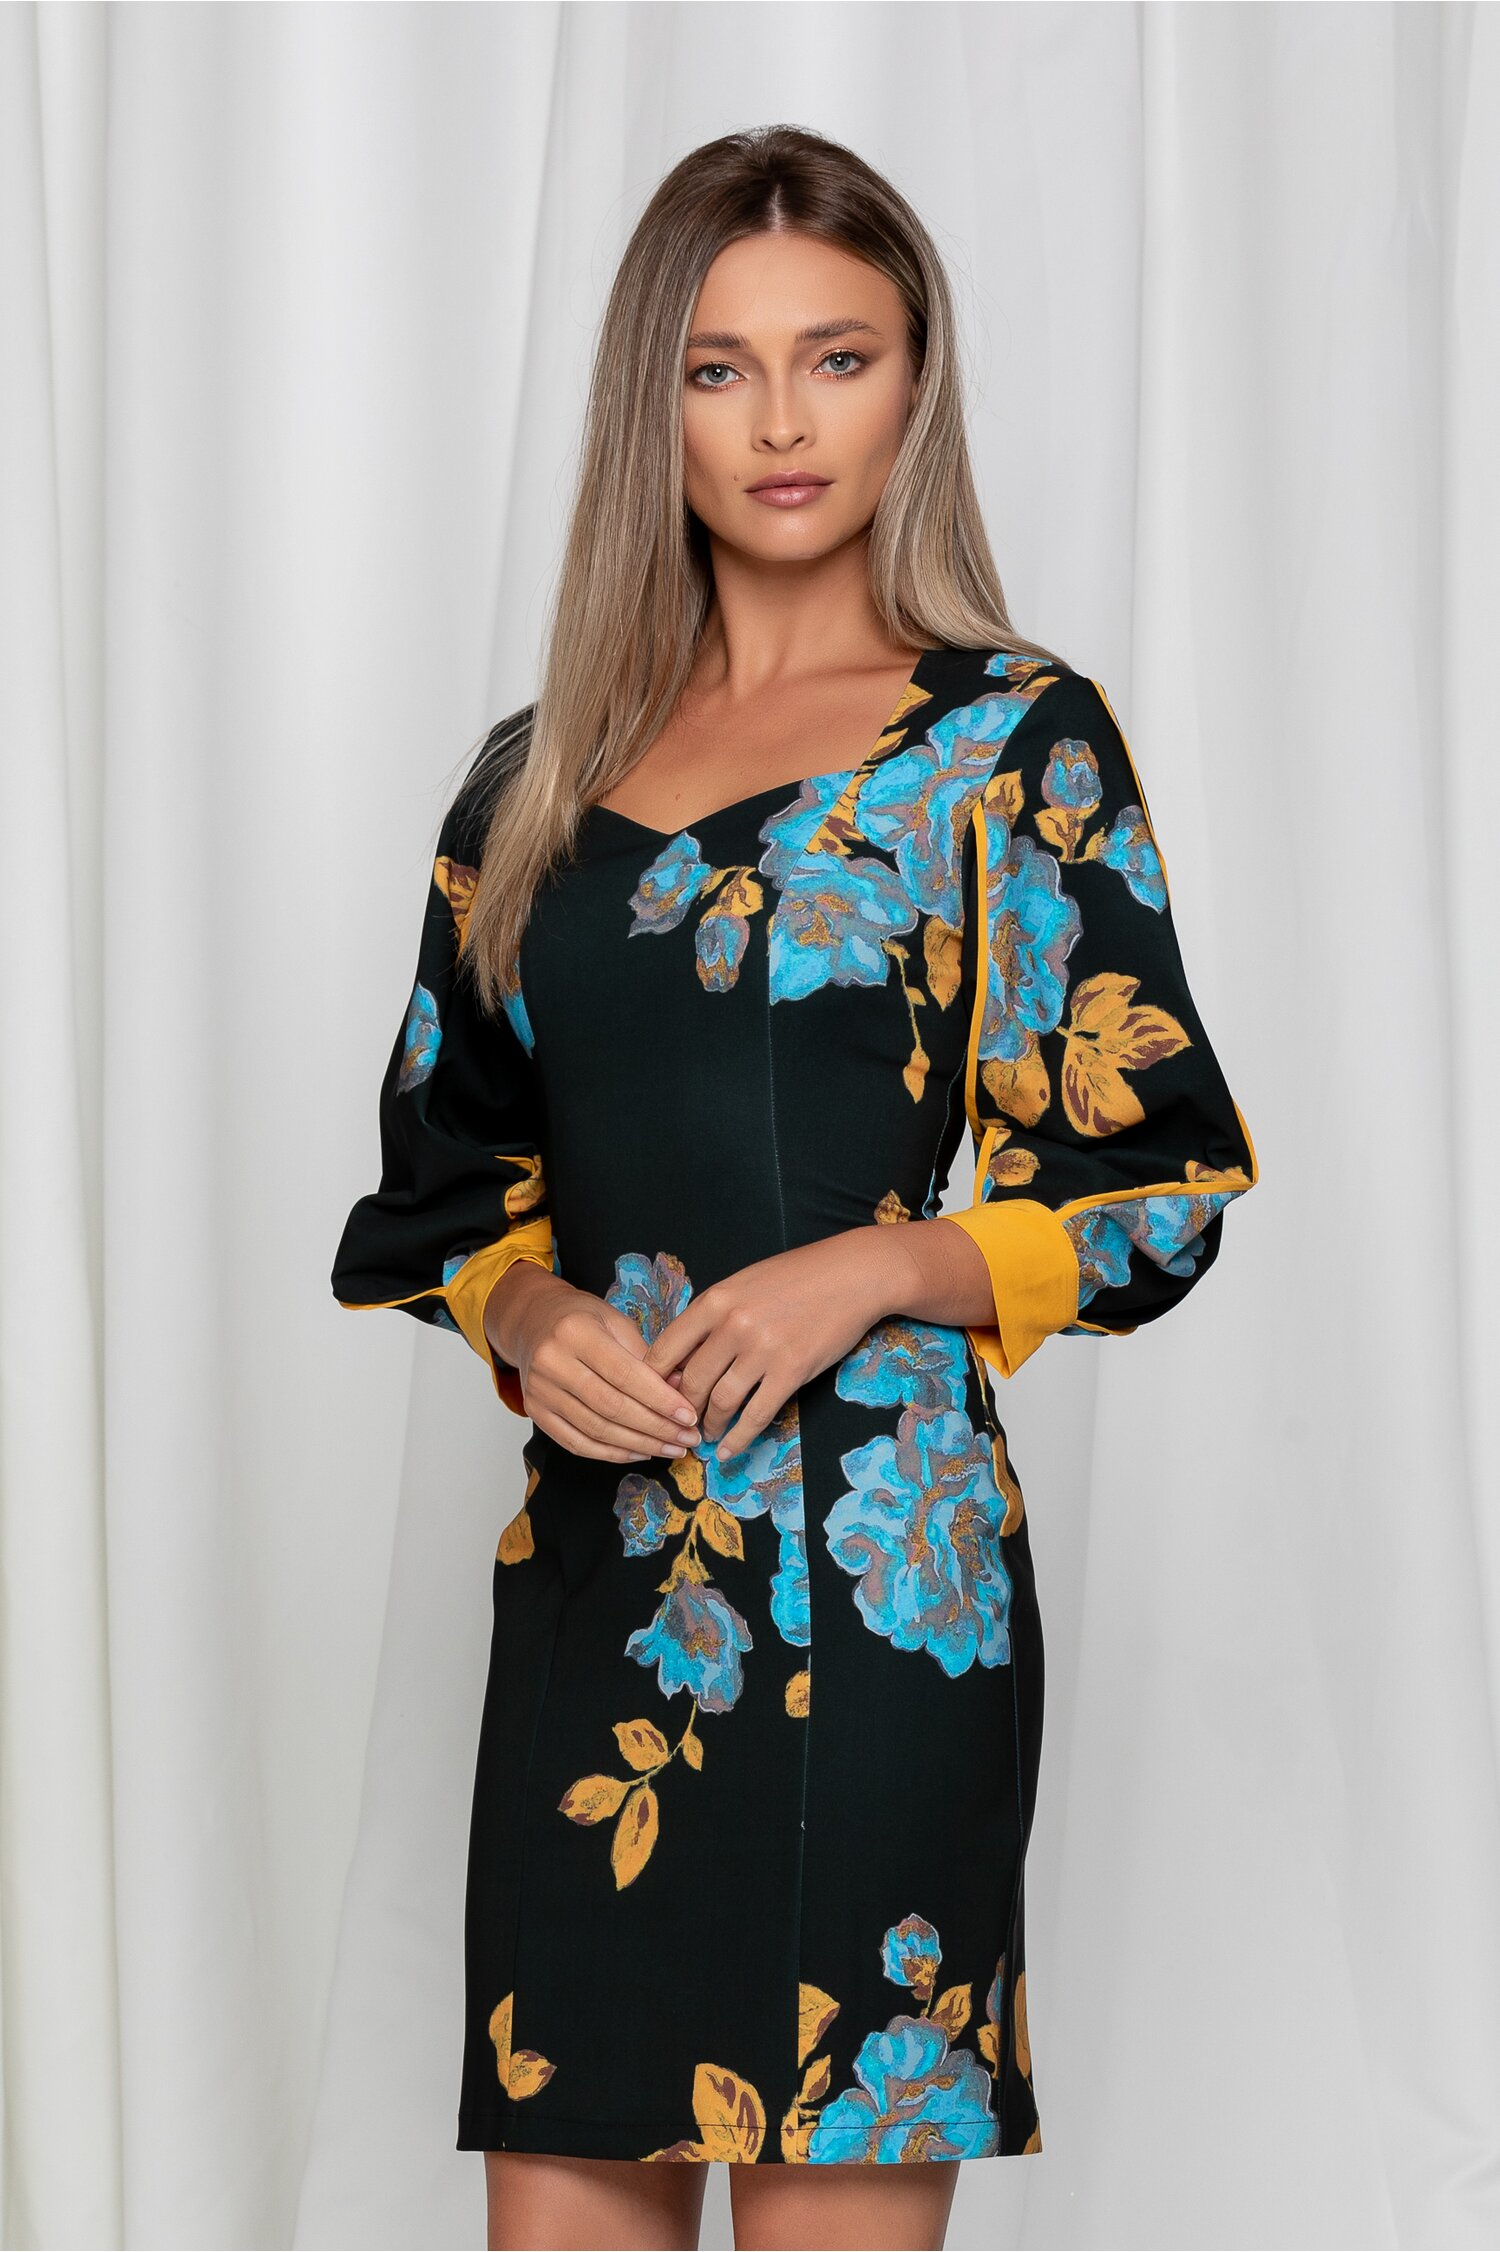 Rochie LaDonna neagra cu imprimeuri florale albastre